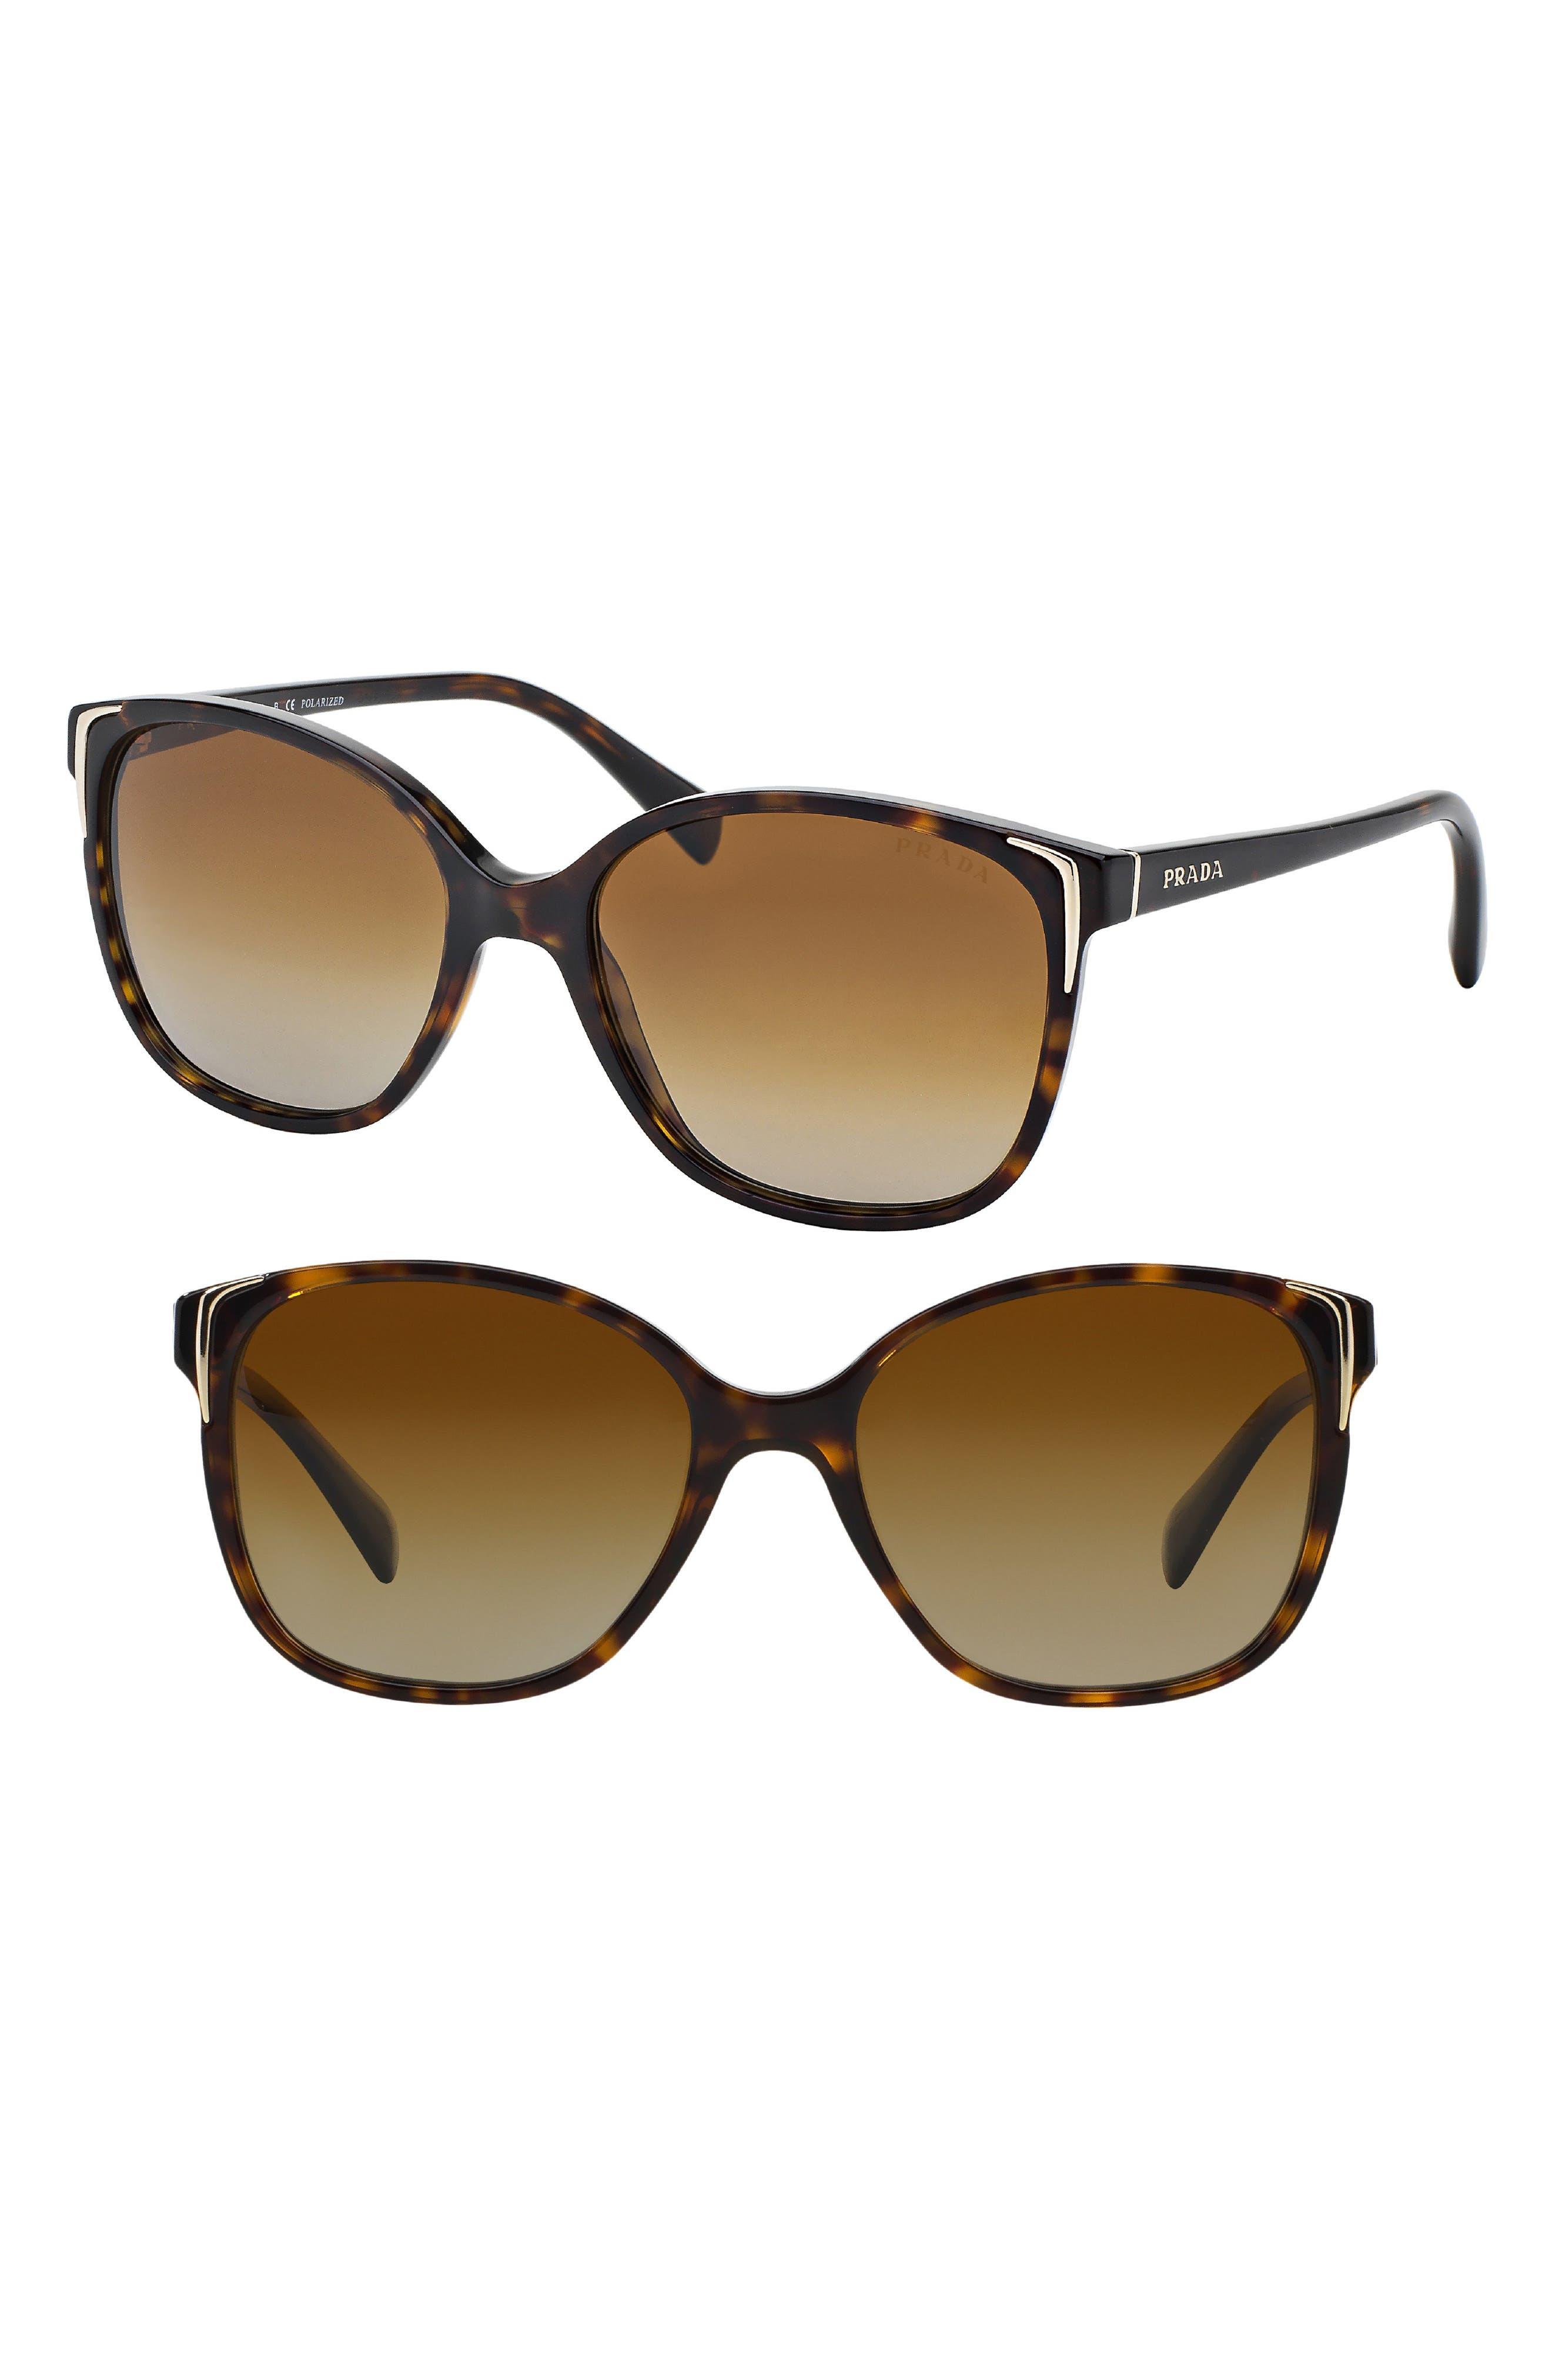 55mm Polarized Cat Eye Sunglasses,                         Main,                         color, Havana